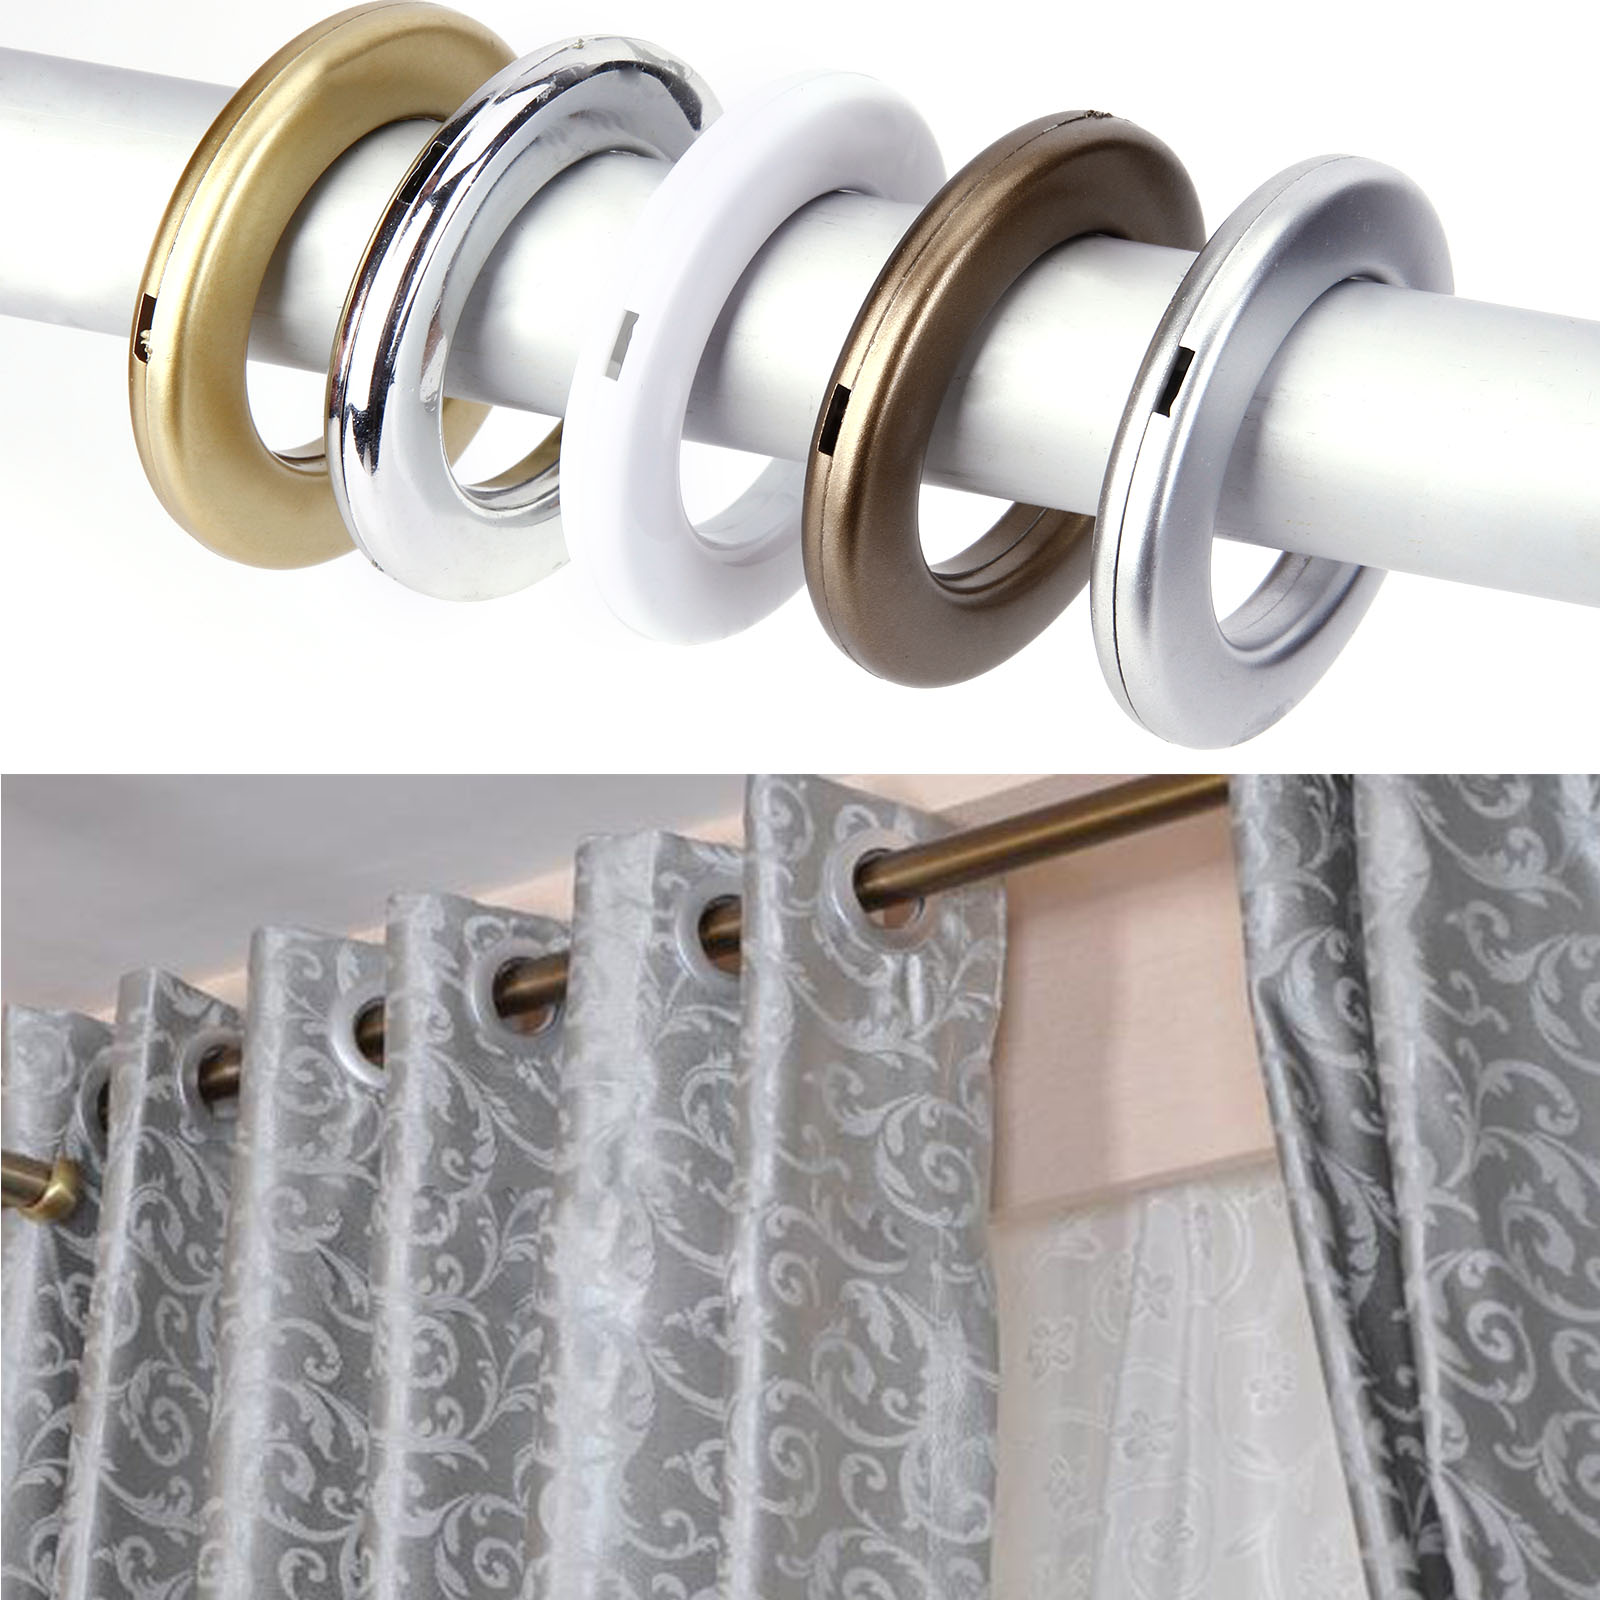 20 40 x stoff sen kunststoff sen durchmesser for Accesorios para colgar cortinas